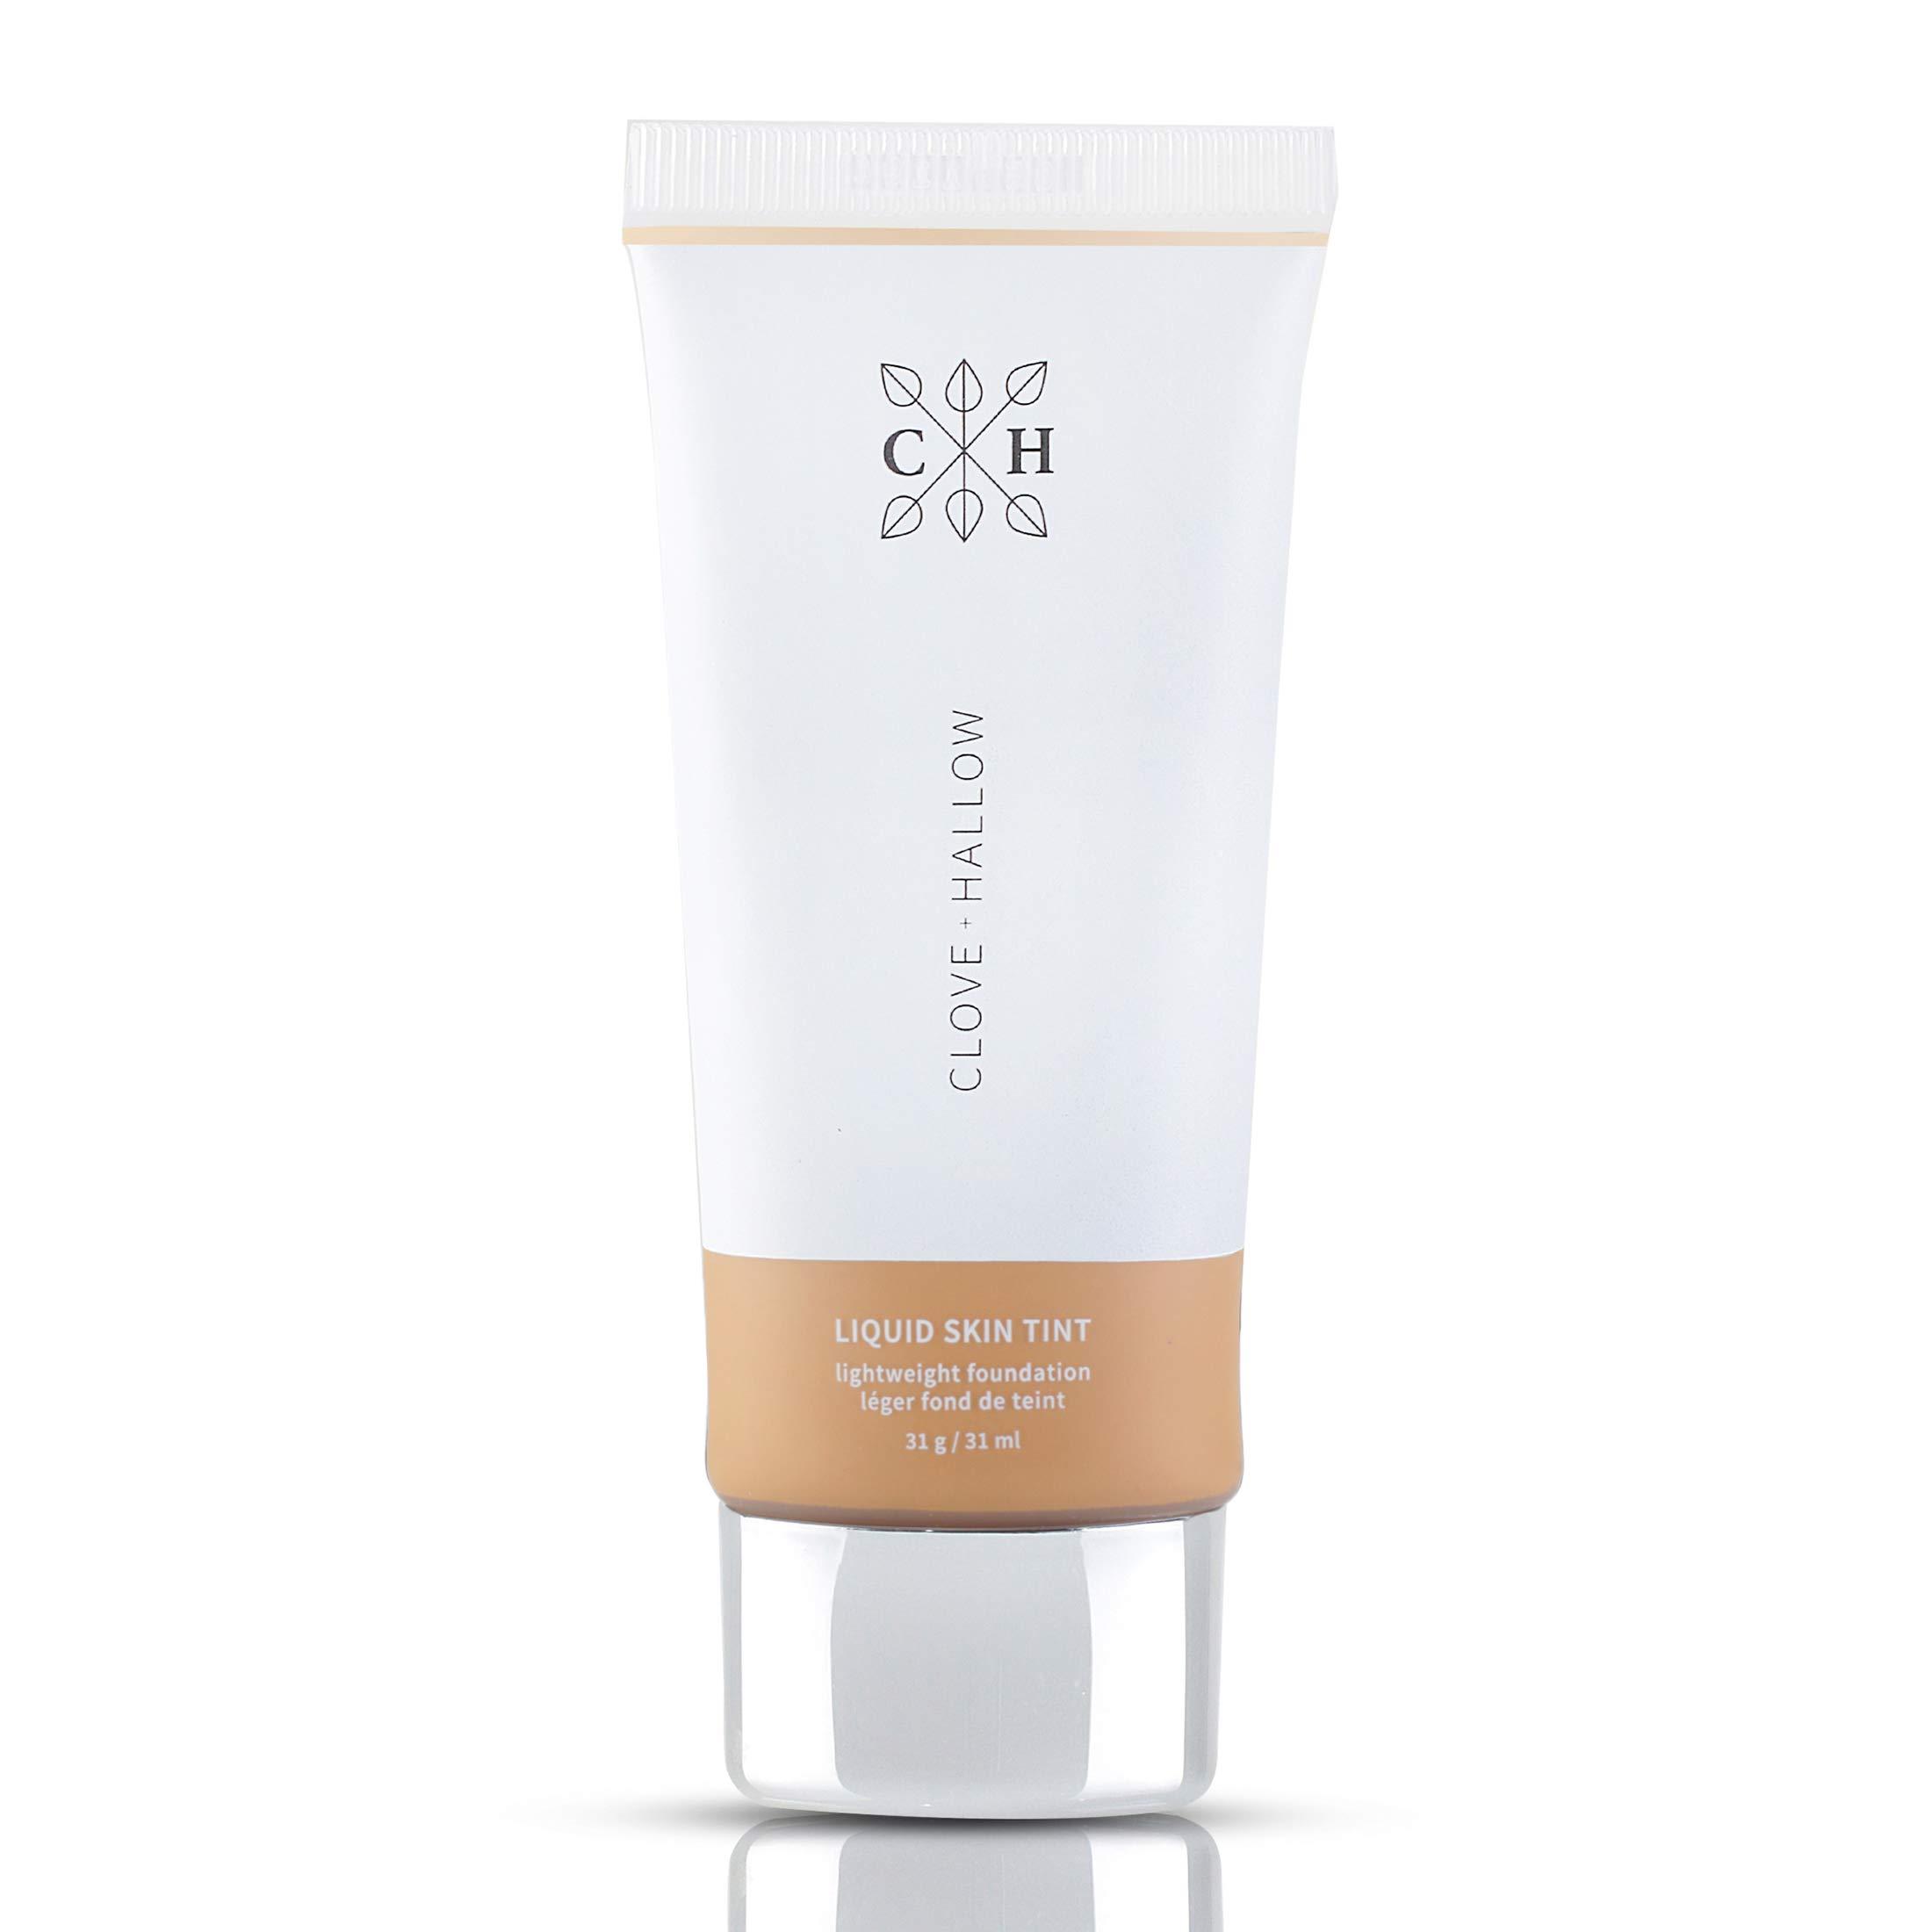 CLOVE + HALLOW Liquid Skin Tint Liquid Foundation Organic Makeup-08